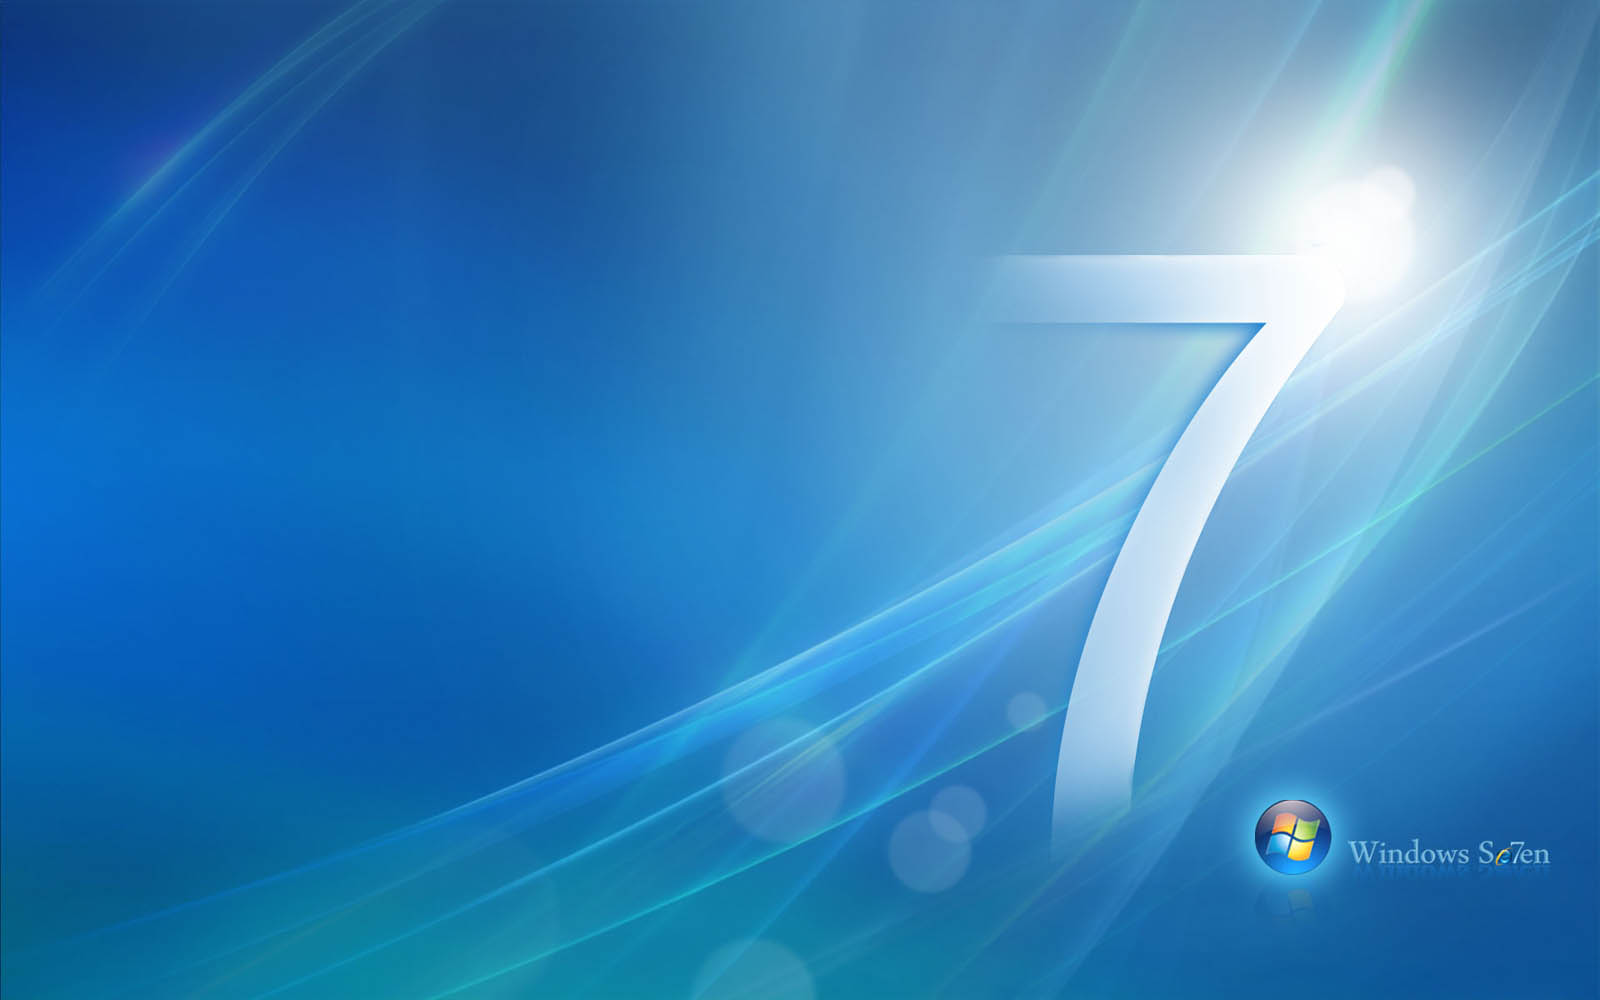 Windows 7 Style Wallpapers Desktop Wallpaper